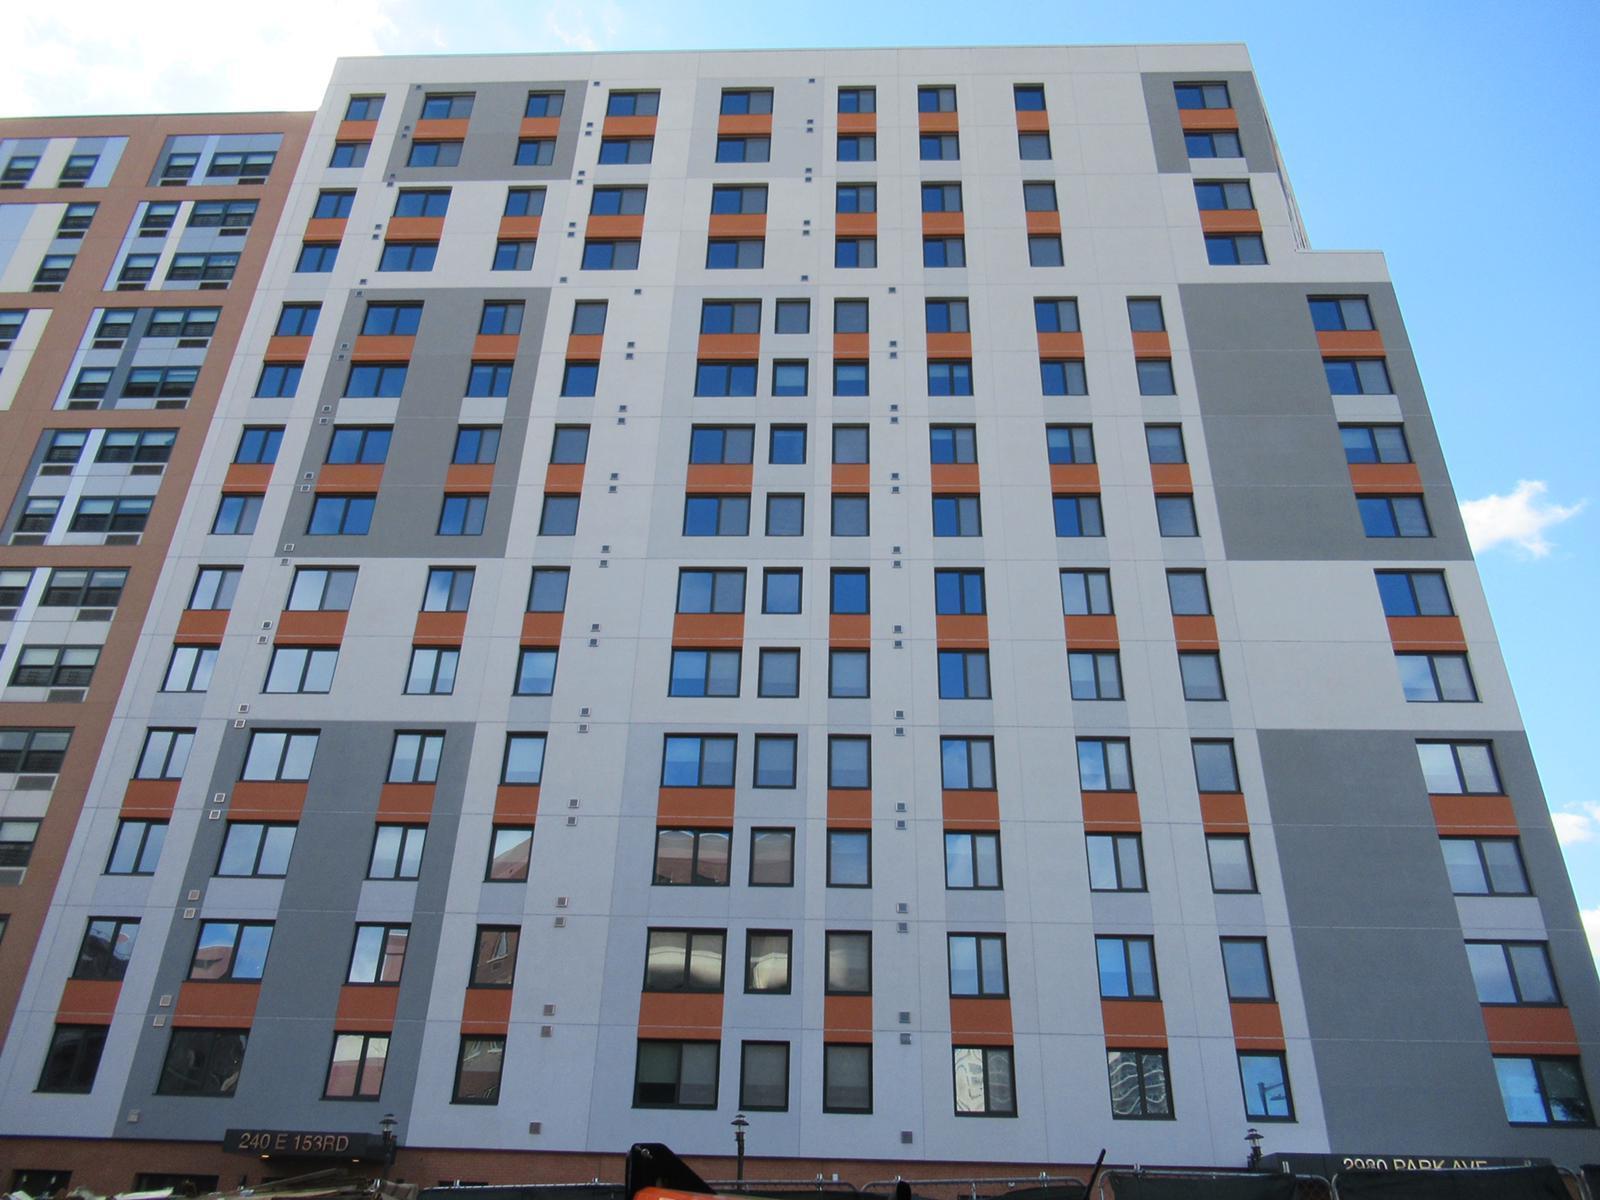 Morris II Apartments with INTUS Windows